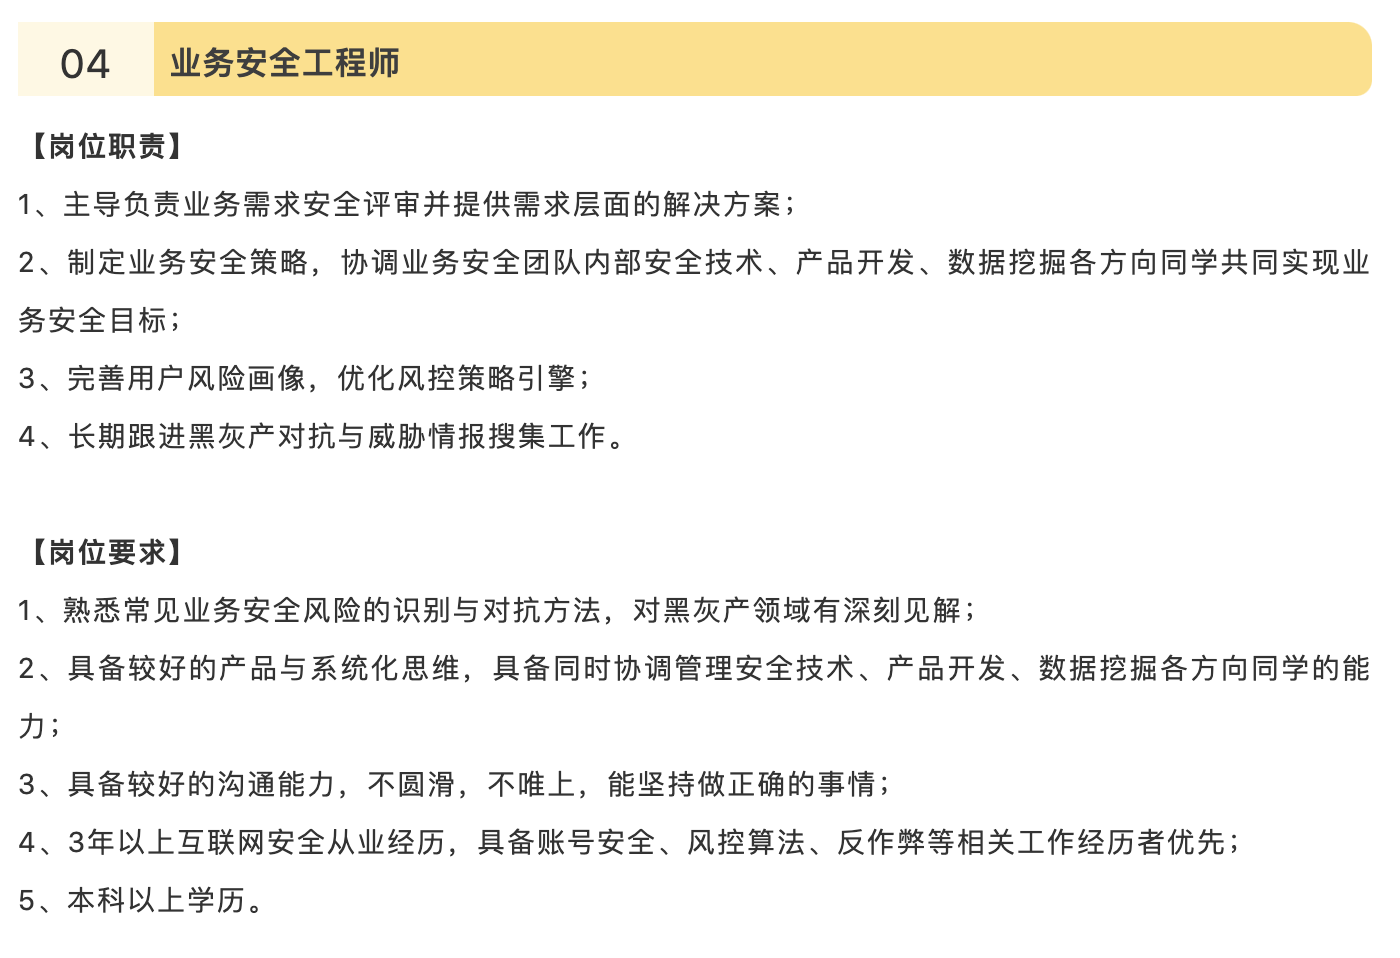 https://momo-mmsrc.oss-cn-hangzhou.aliyuncs.com/img-65f4c47c-442a-33ea-8e4d-f38834517679.png